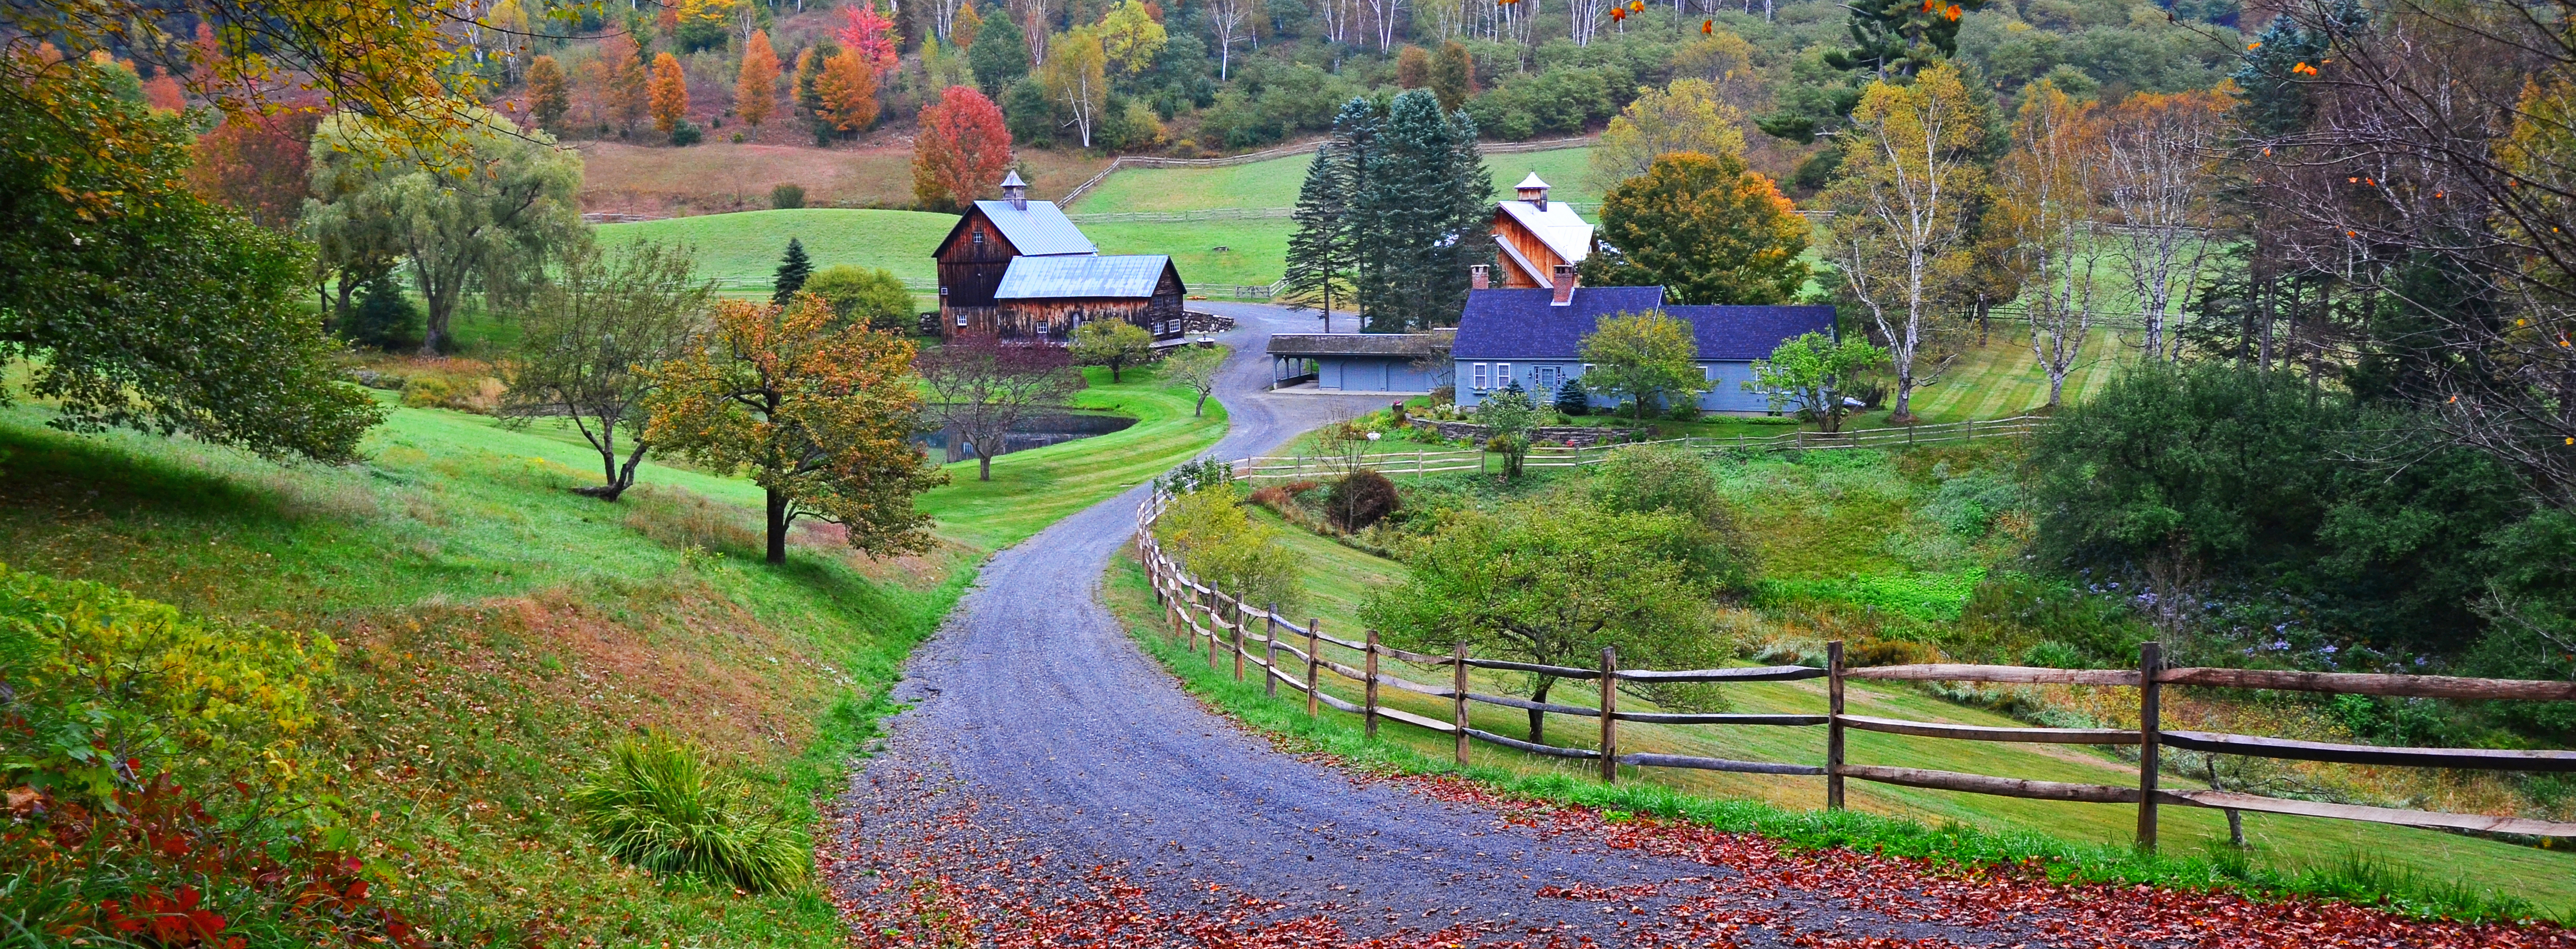 Vermont September 28, 2012 (128)aa_19x7.